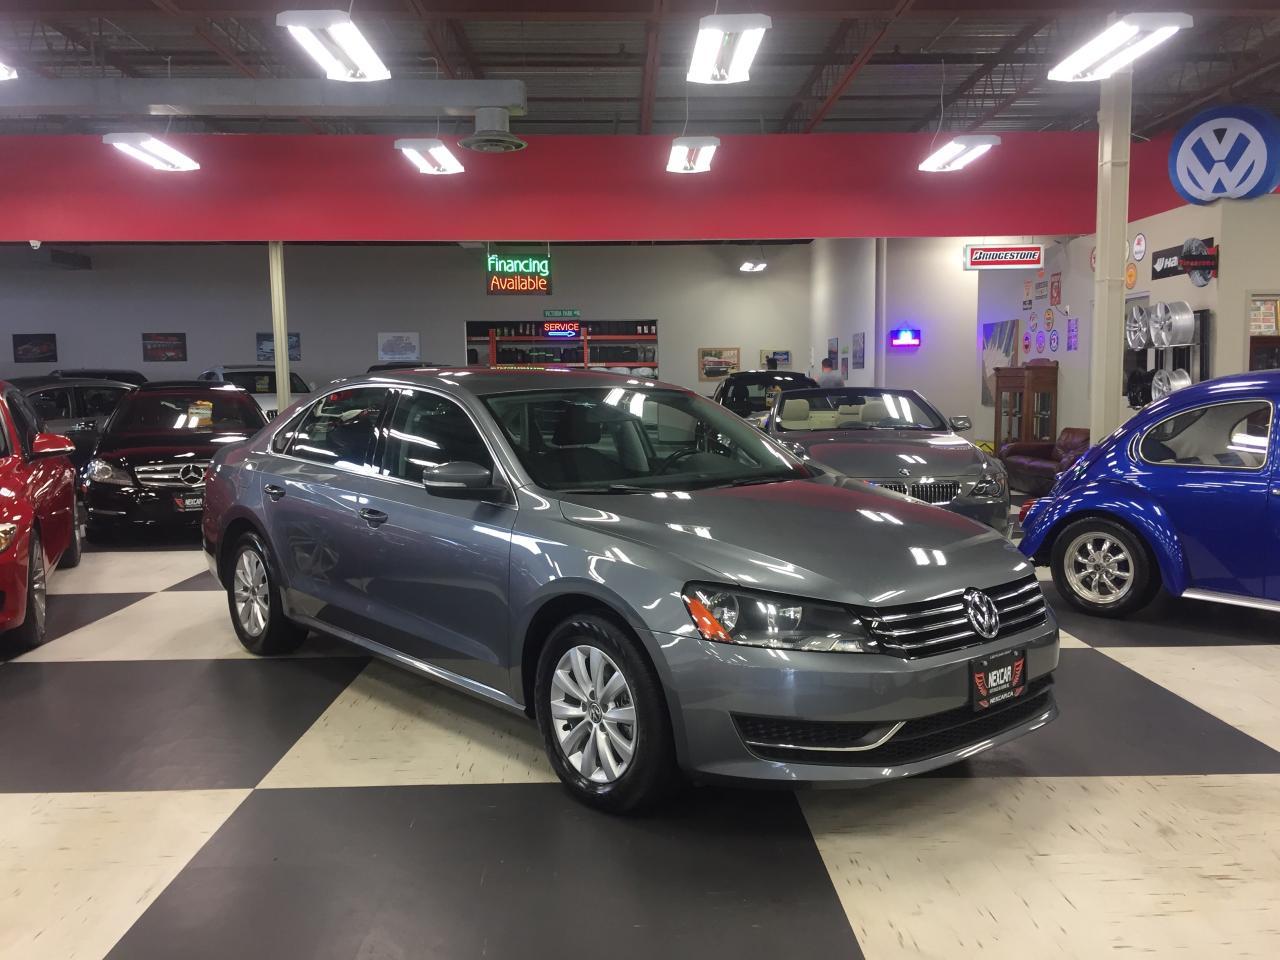 2015 Volkswagen Passat 1.8 TSI TRENDLINE AUT0 A/C CRUISE H/SEATS 108K